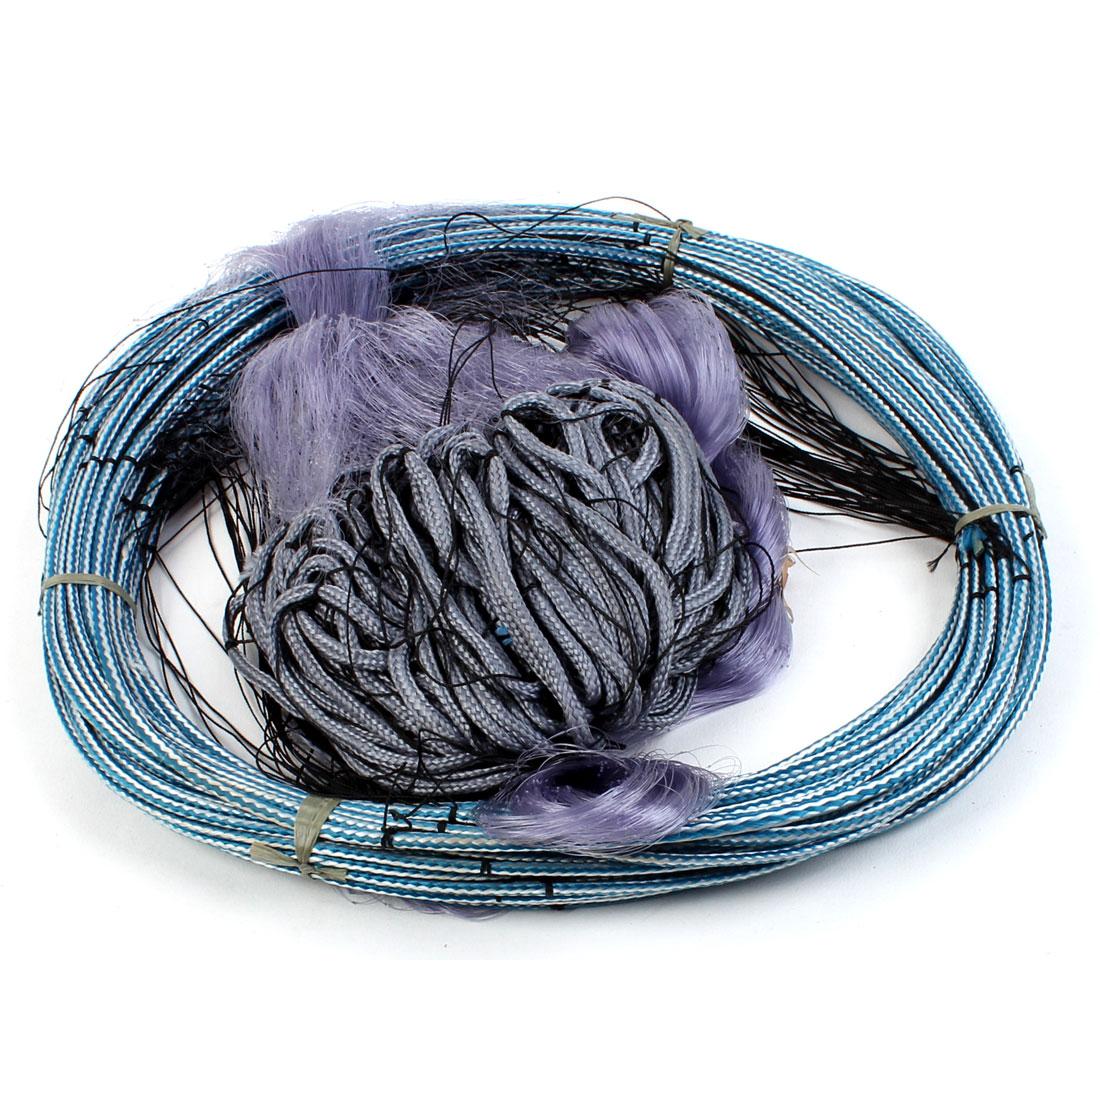 30M Length 1.8M Depth 3.5cm x 3.5cm Mesh Hole Fishing Tool Fish Gill Landing Net